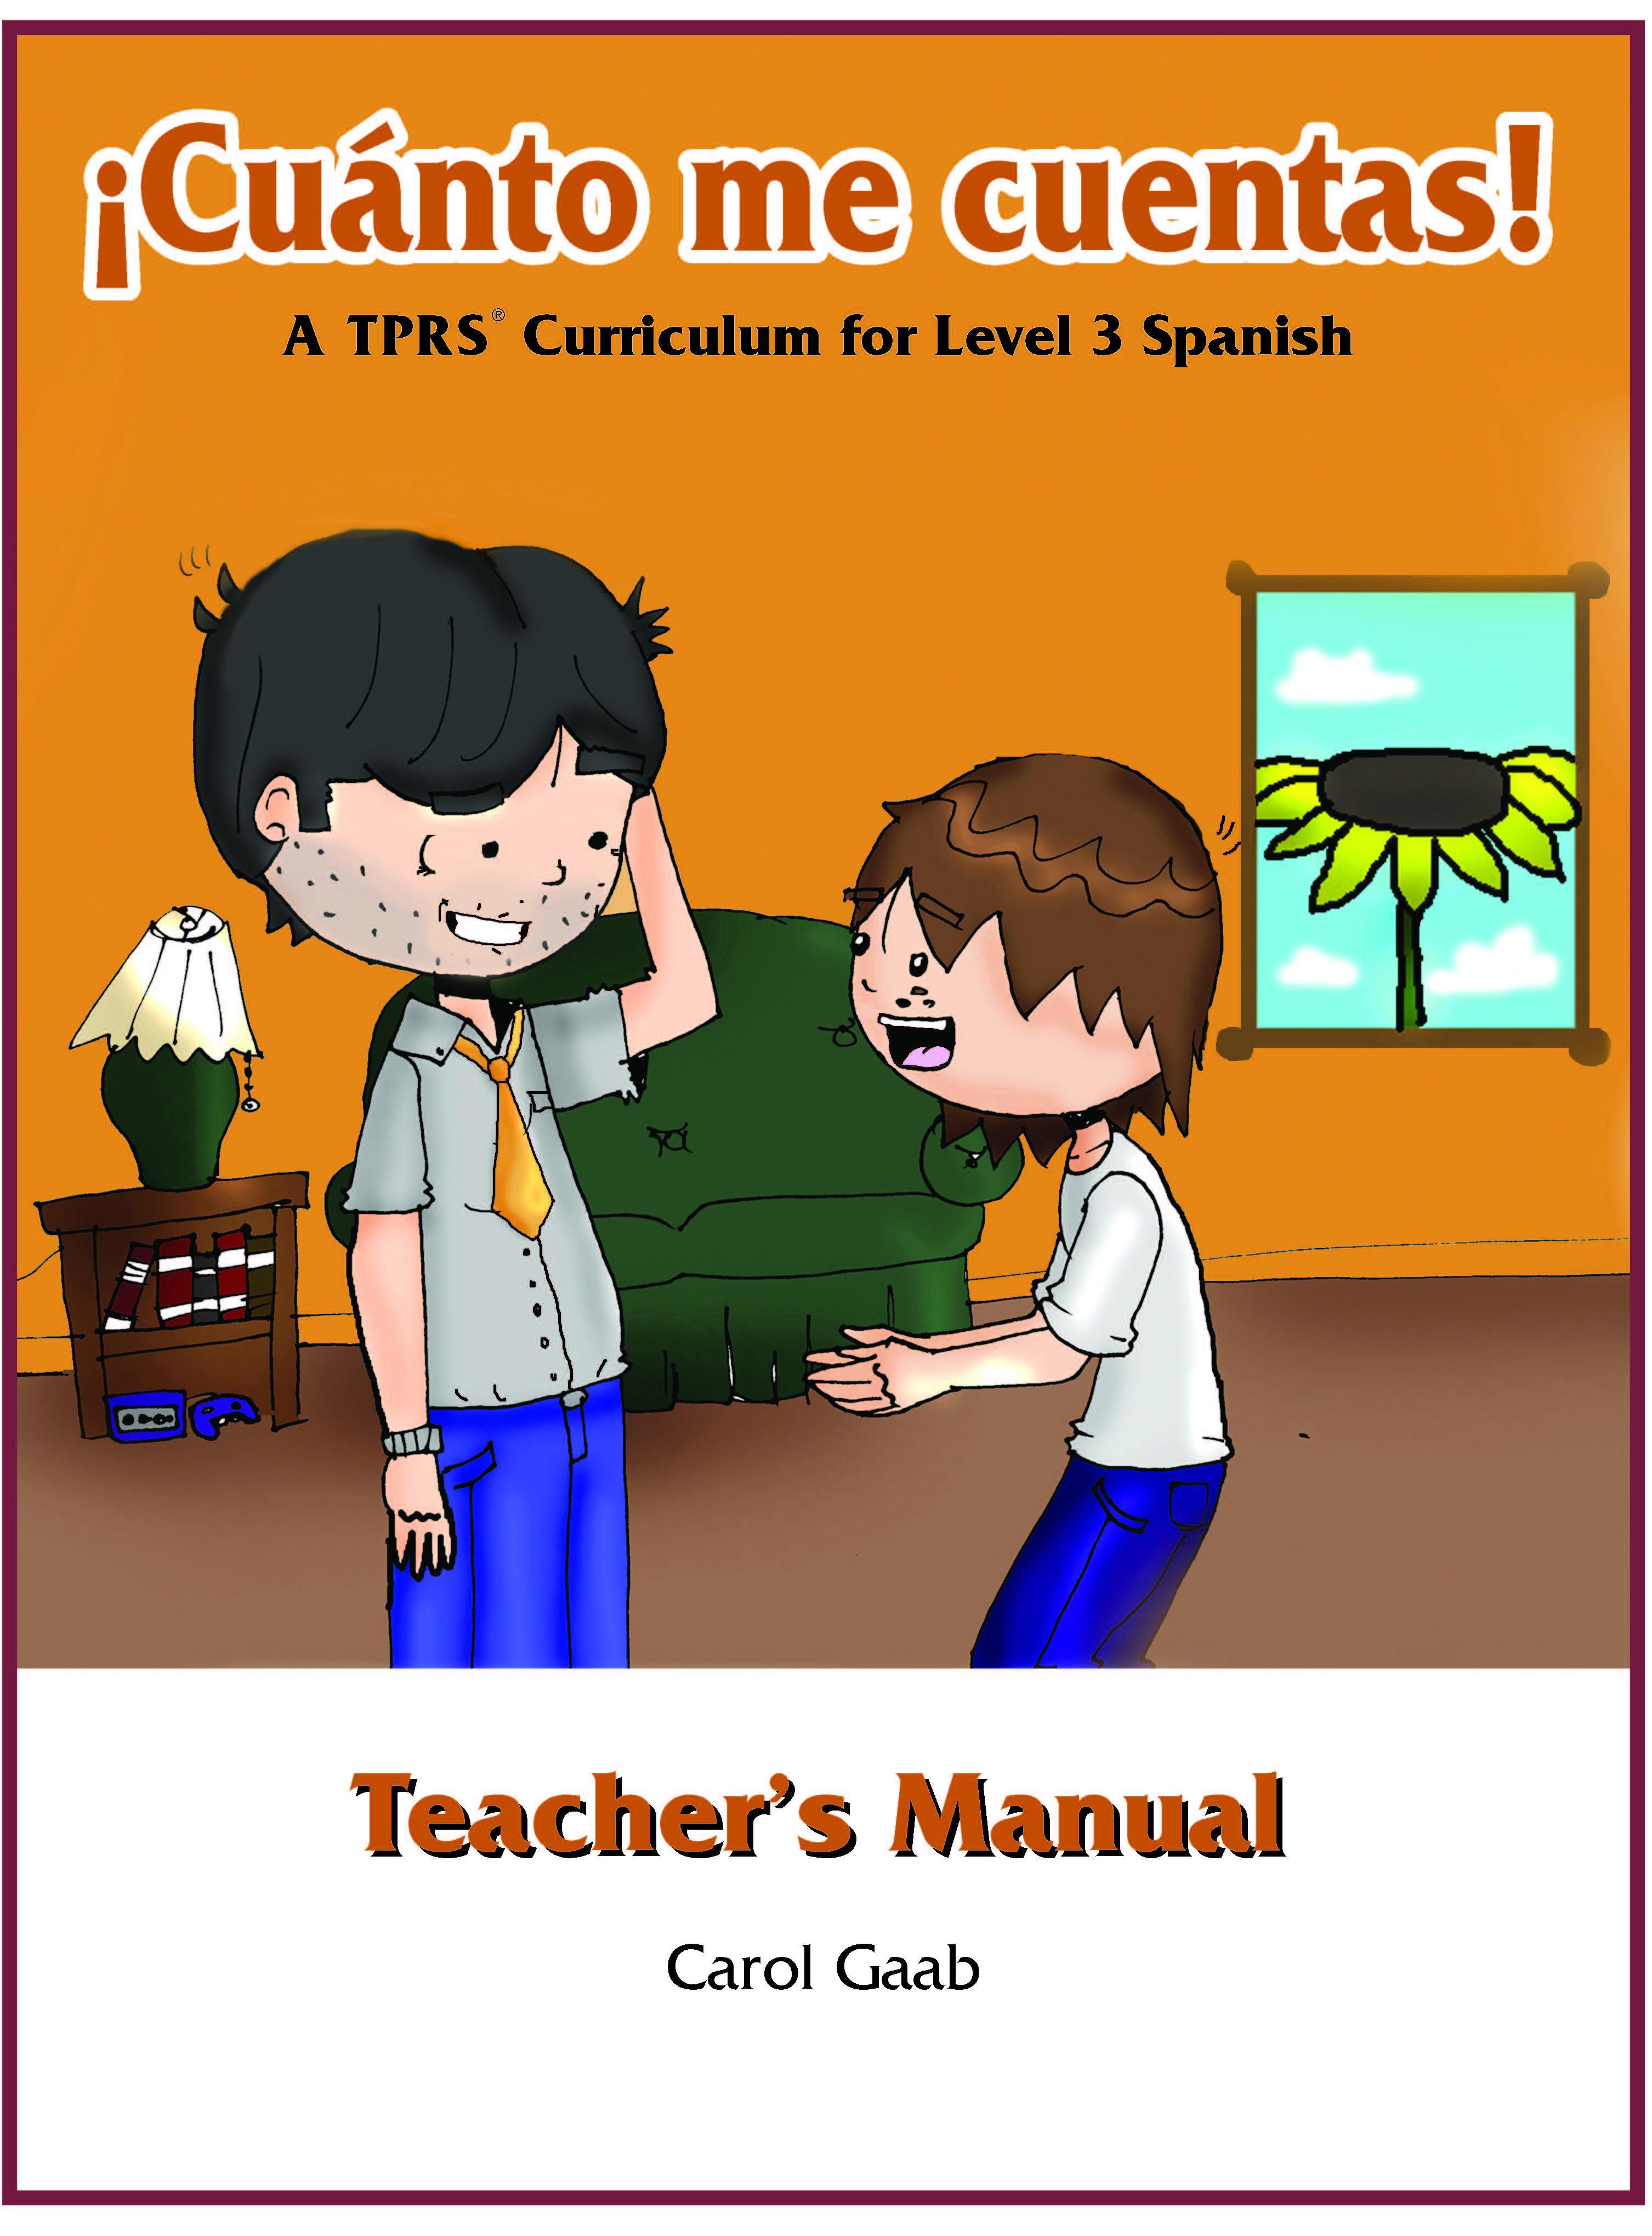 ¡Cuánto me cuentas! Teacher's Manual